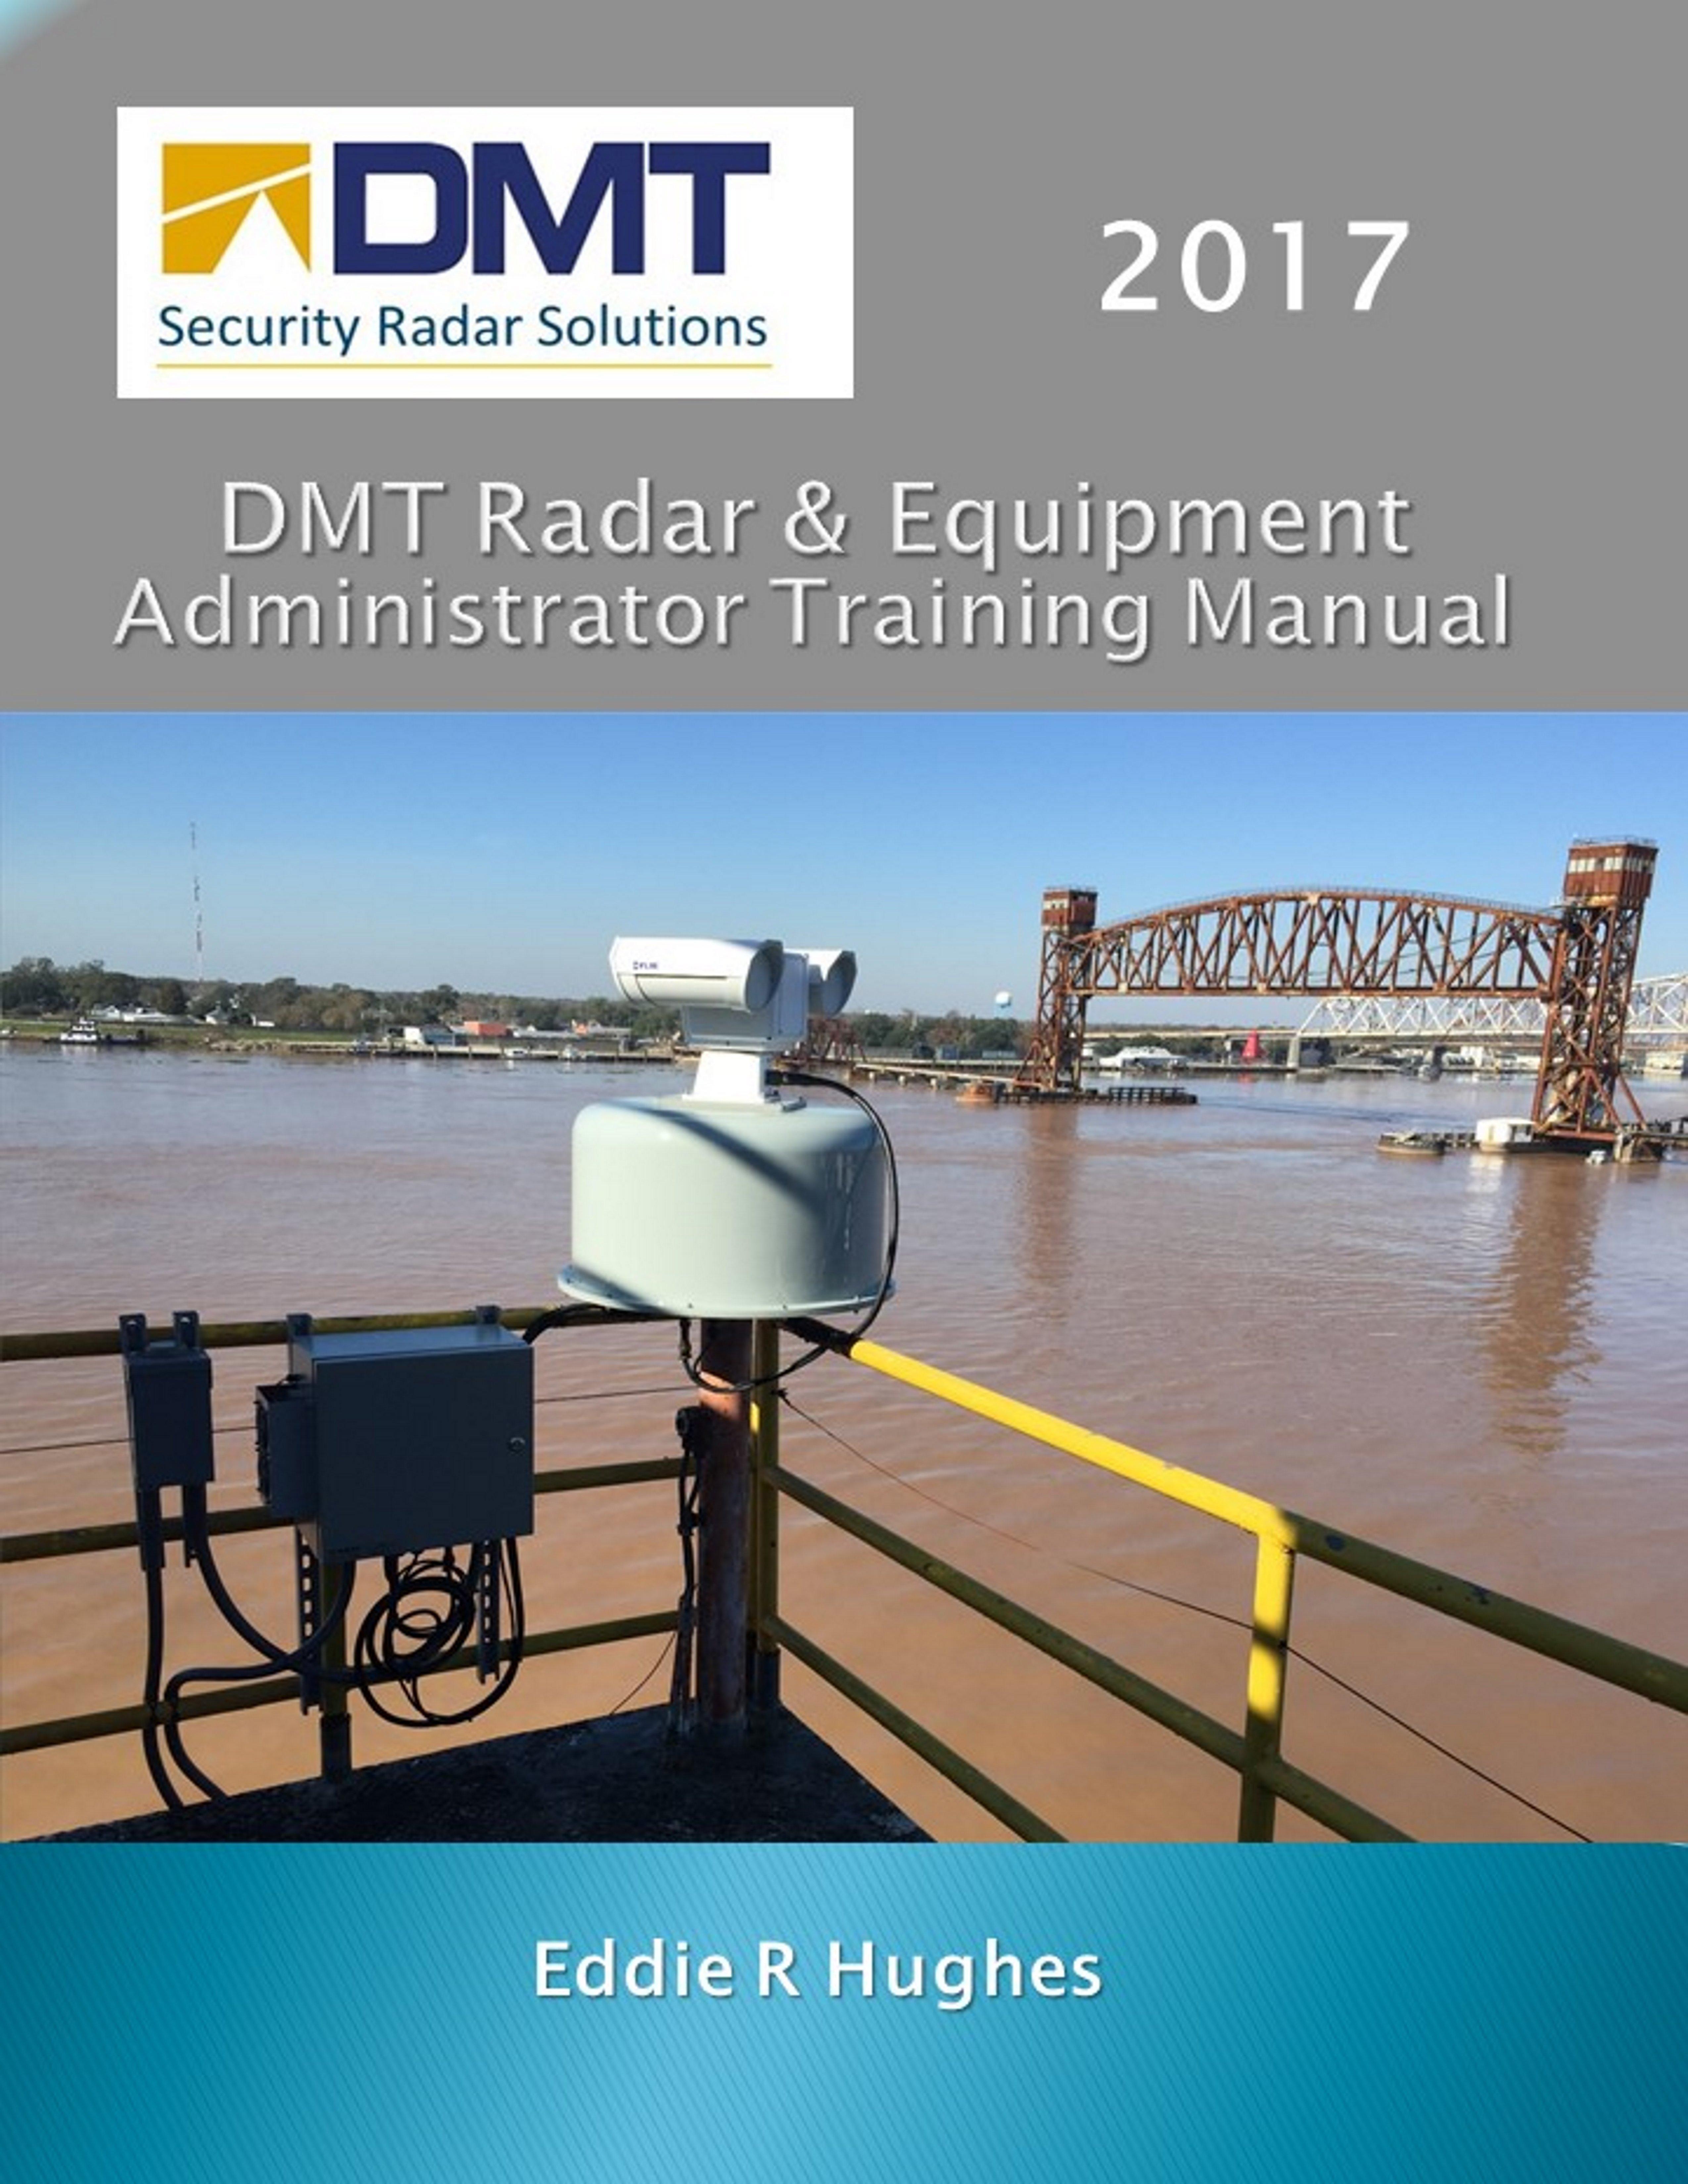 DMT Radar & Equipment Administrator Training Manual 00002